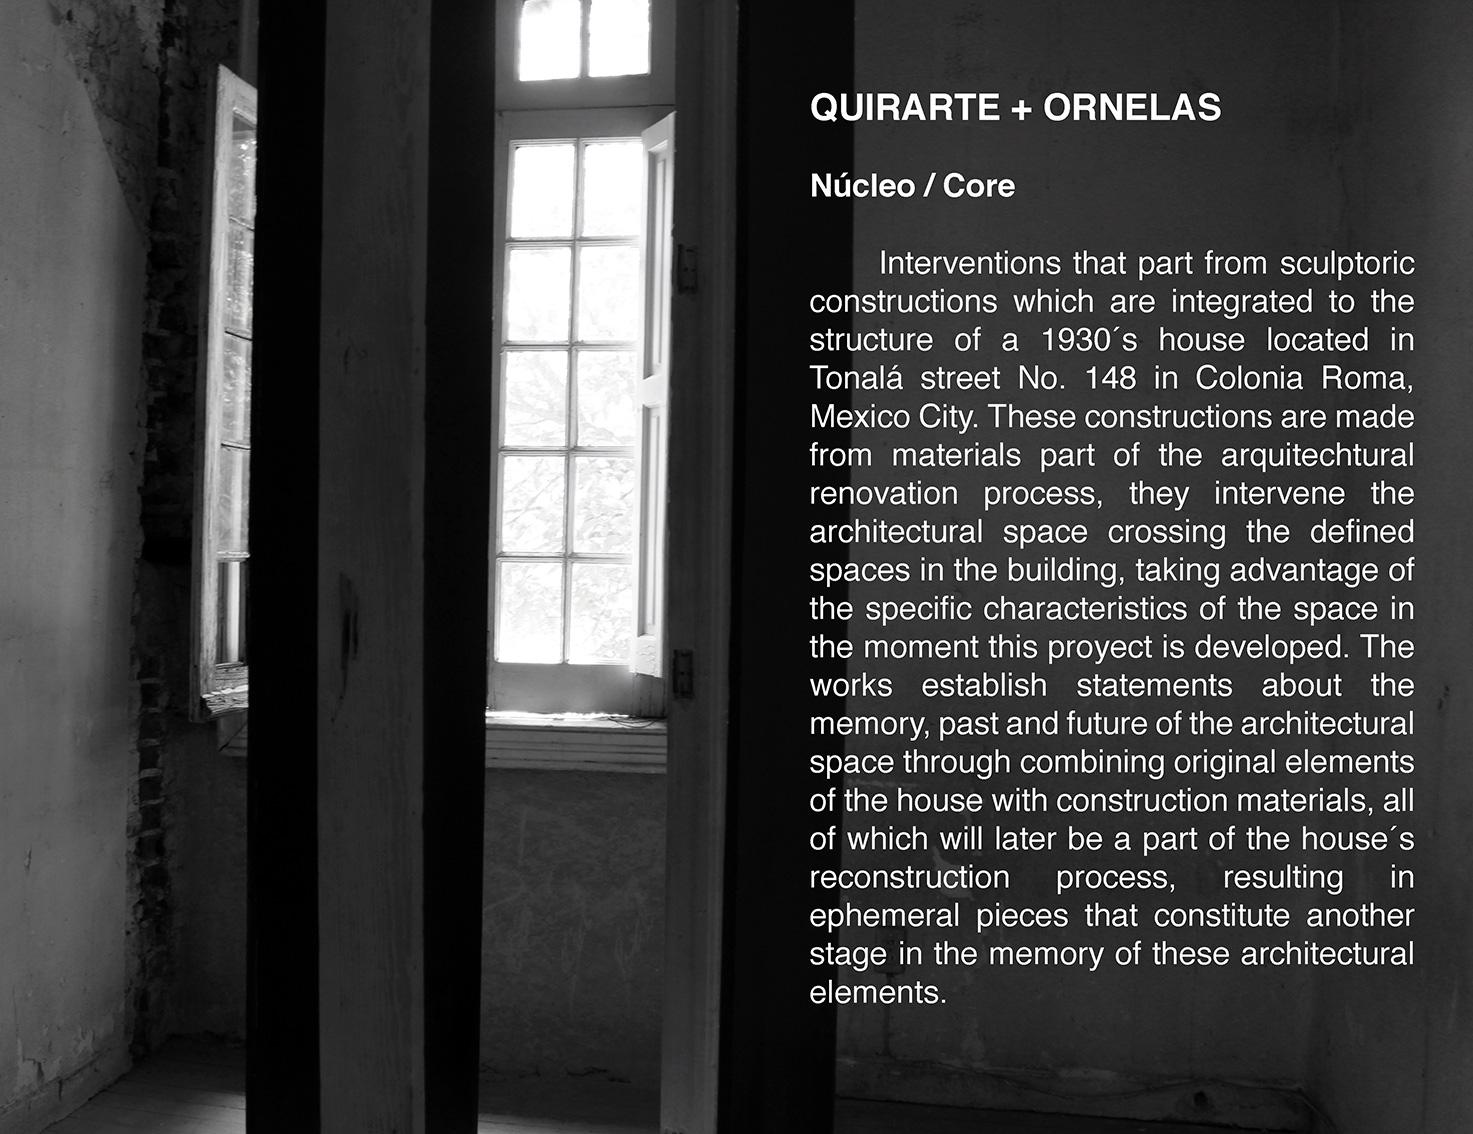 002-texto-núcleo-ingles-web.jpg